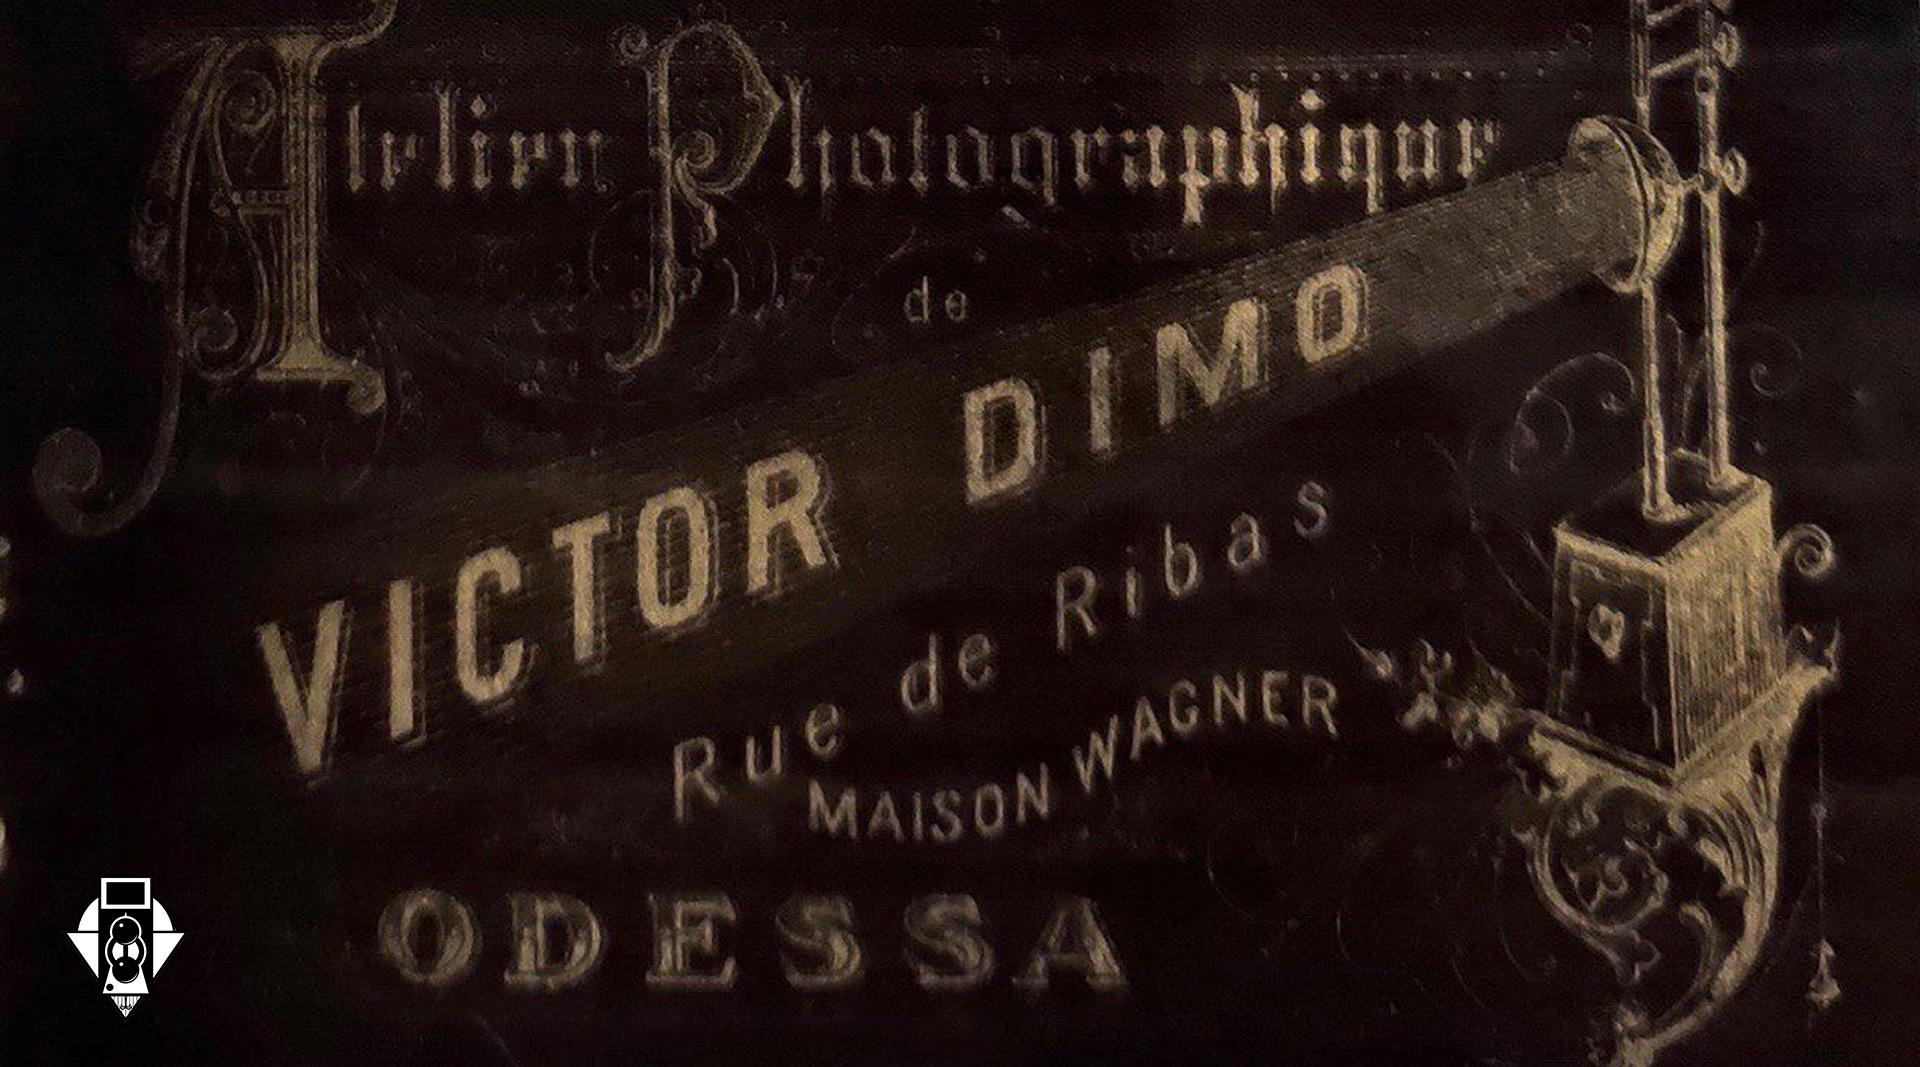 Фотограф Виктор Димо (Viktor Dimo). 1870-1890-е годы